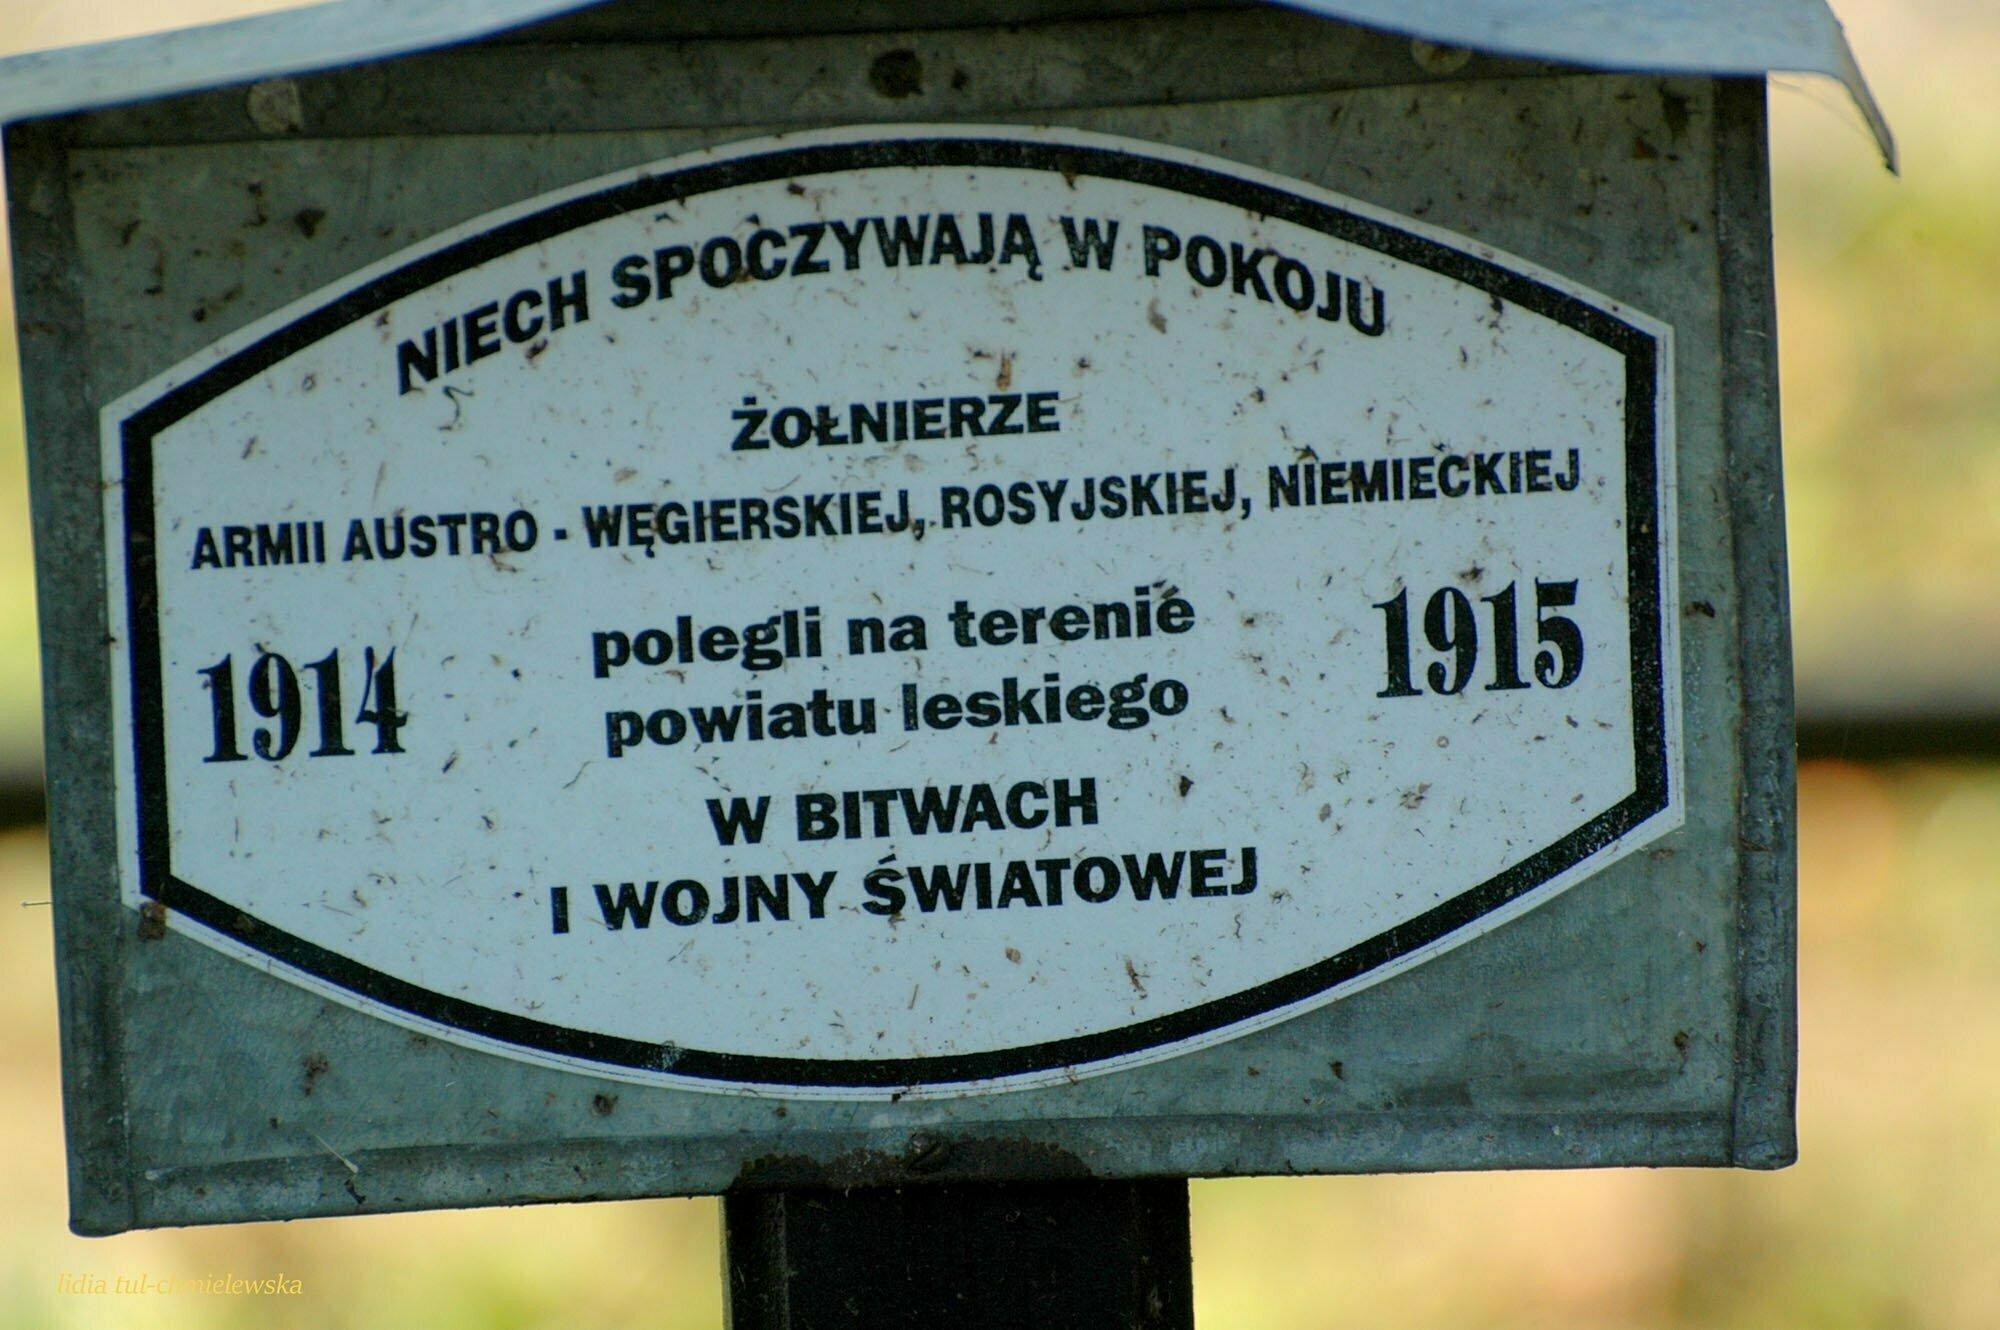 Cmentarz wojskowy w Lesku / fot. Lidia Tul-Chmielewska